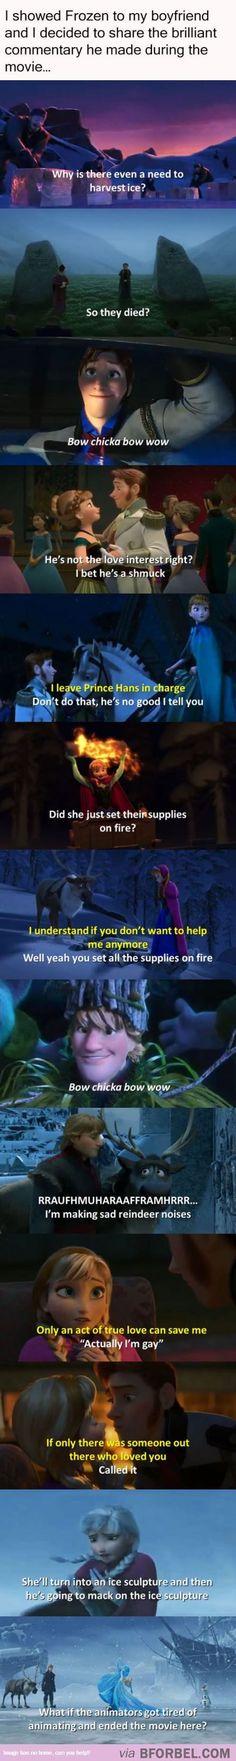 Funny disney memes humor frozen 34 Ideas for 2019 Disney Pixar, Heros Disney, Disney And Dreamworks, Disney Frozen, Olaf Frozen, Funny Disney Memes, Funny Memes, Hilarious, Funny Quotes